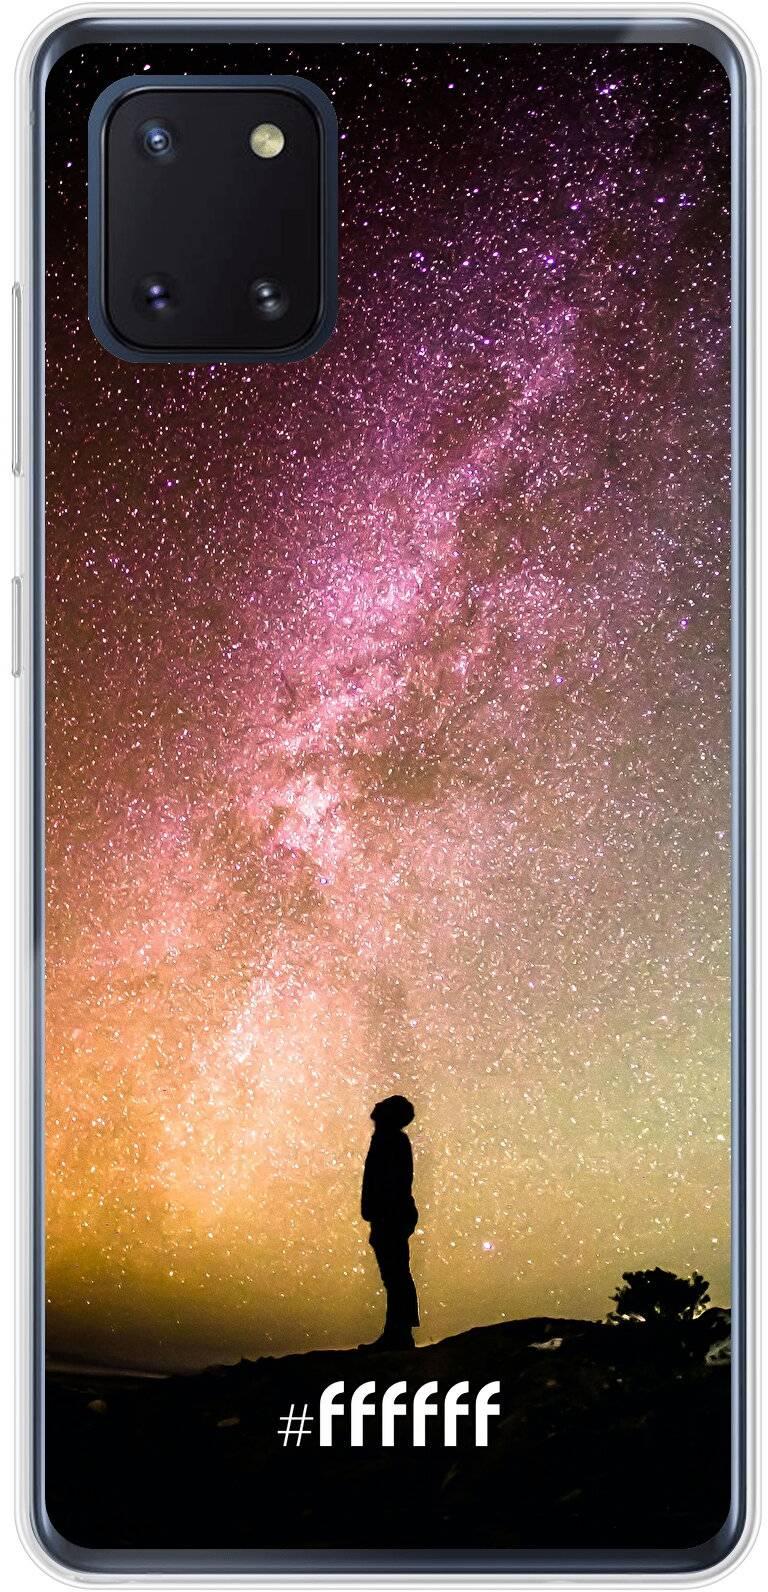 Watching the Stars Galaxy Note 10 Lite